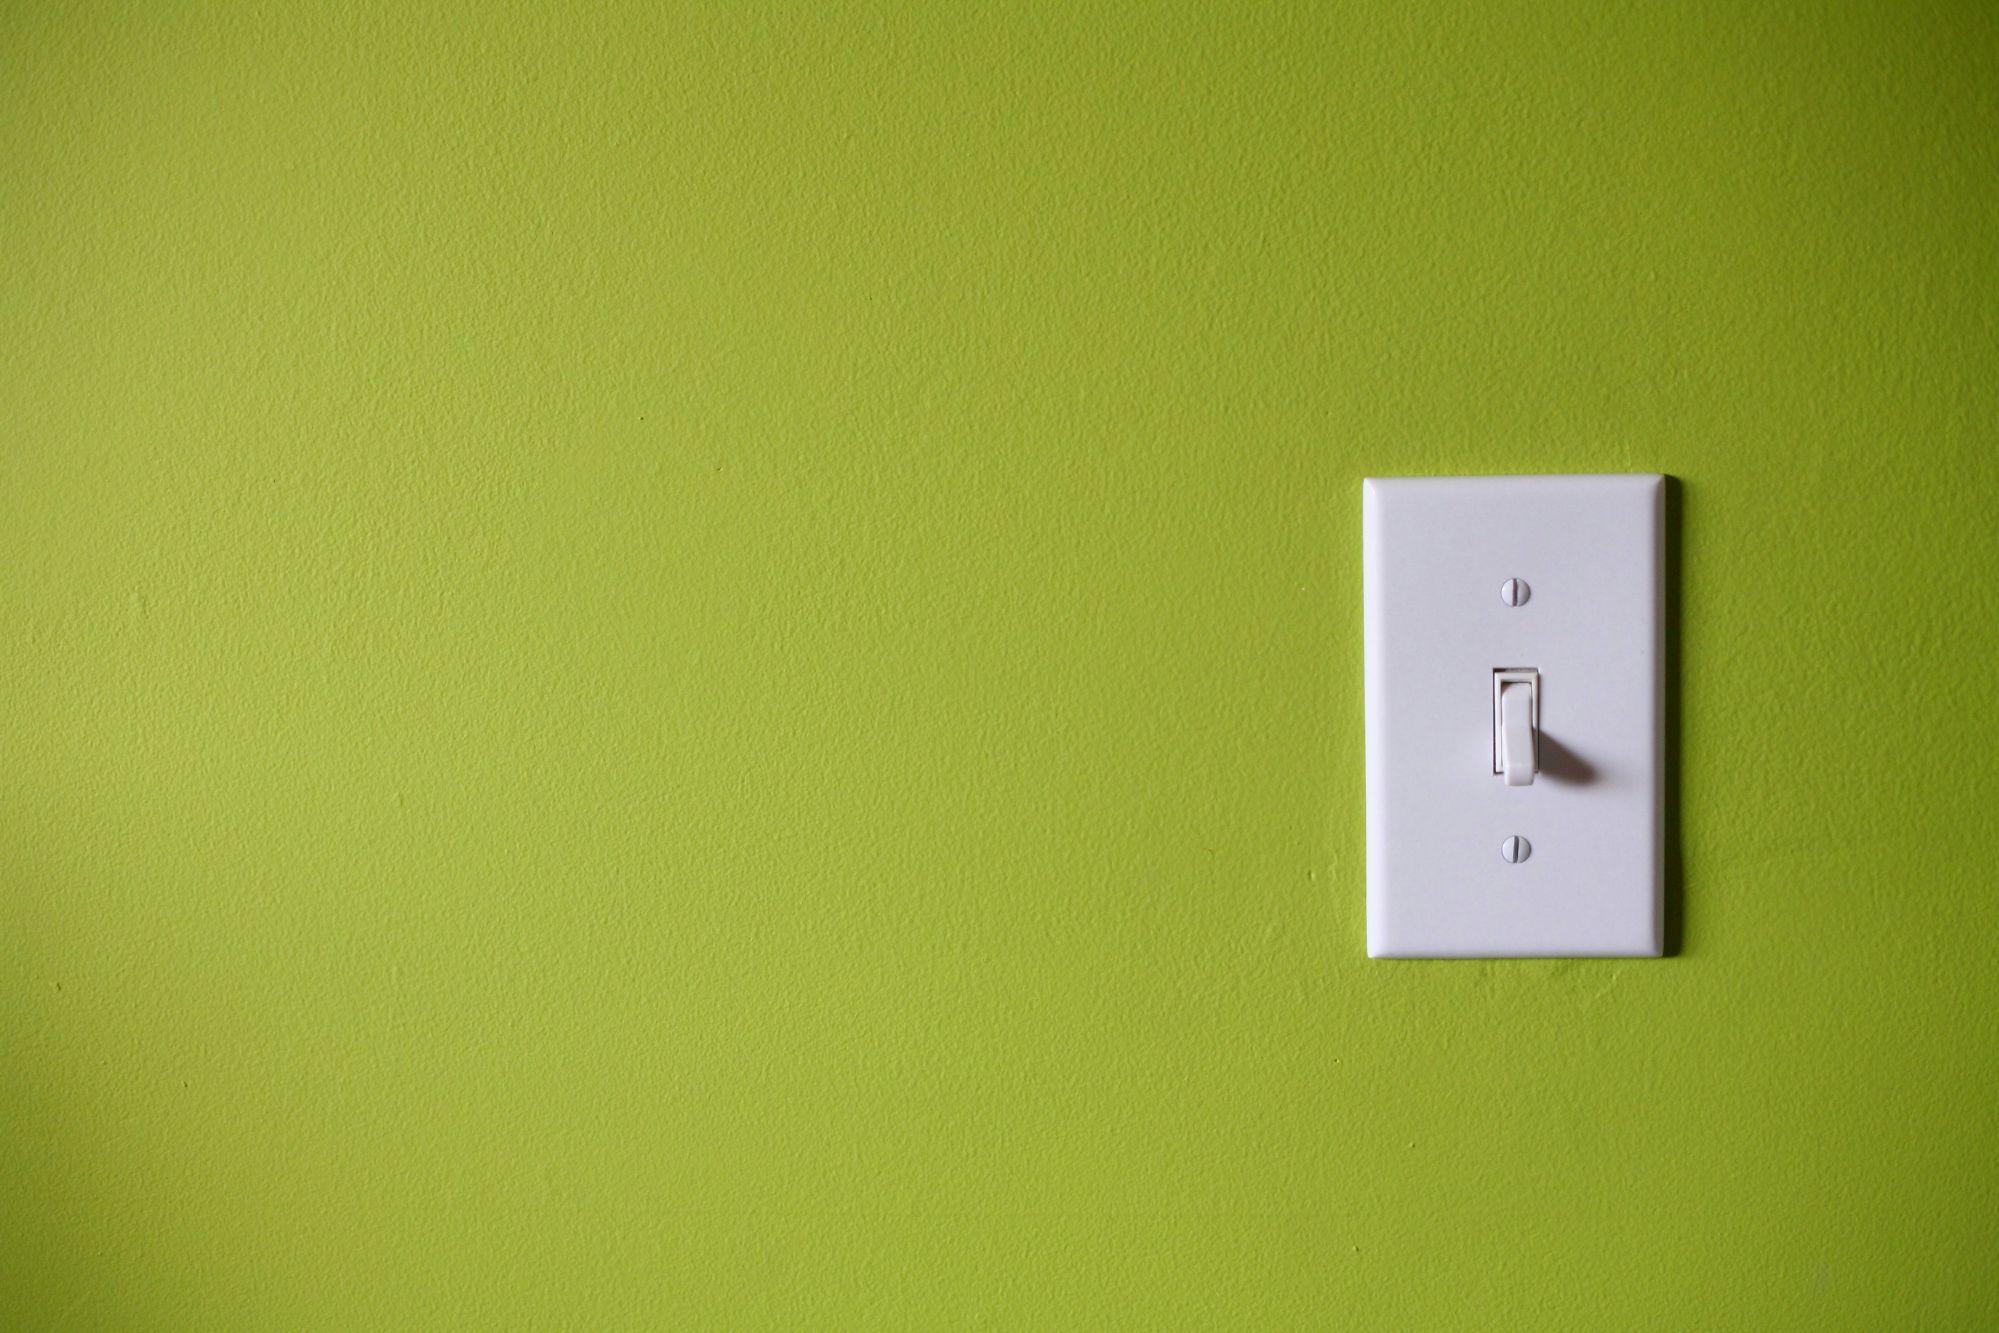 hight resolution of light 3 way switch internal diagram